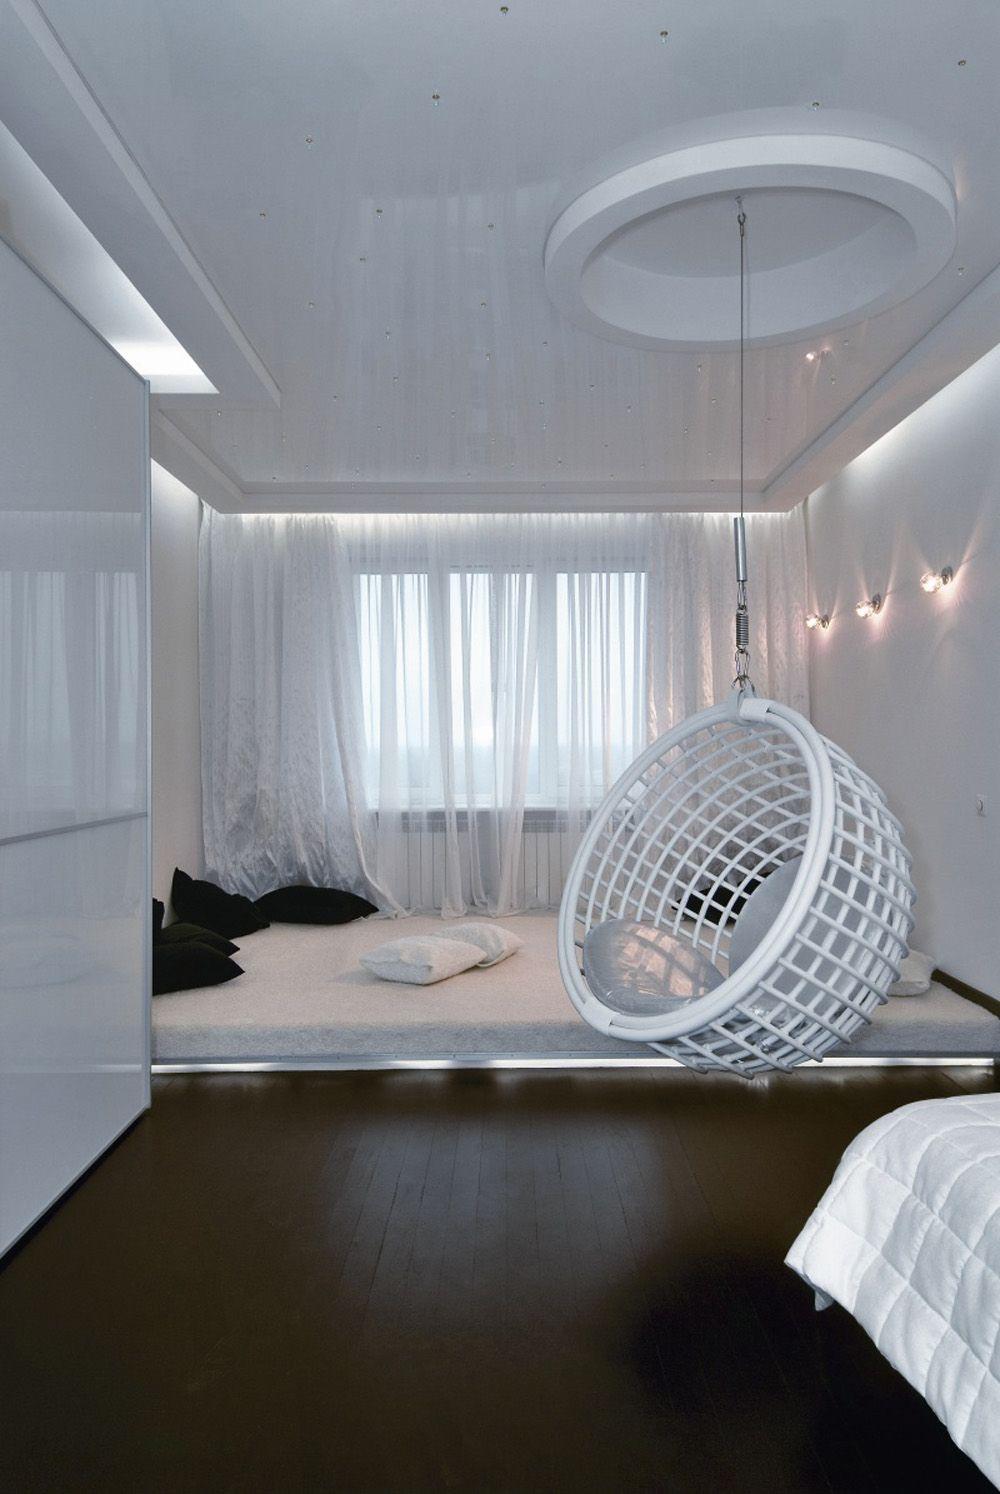 futuristic apartment interior with predominantly white furniture